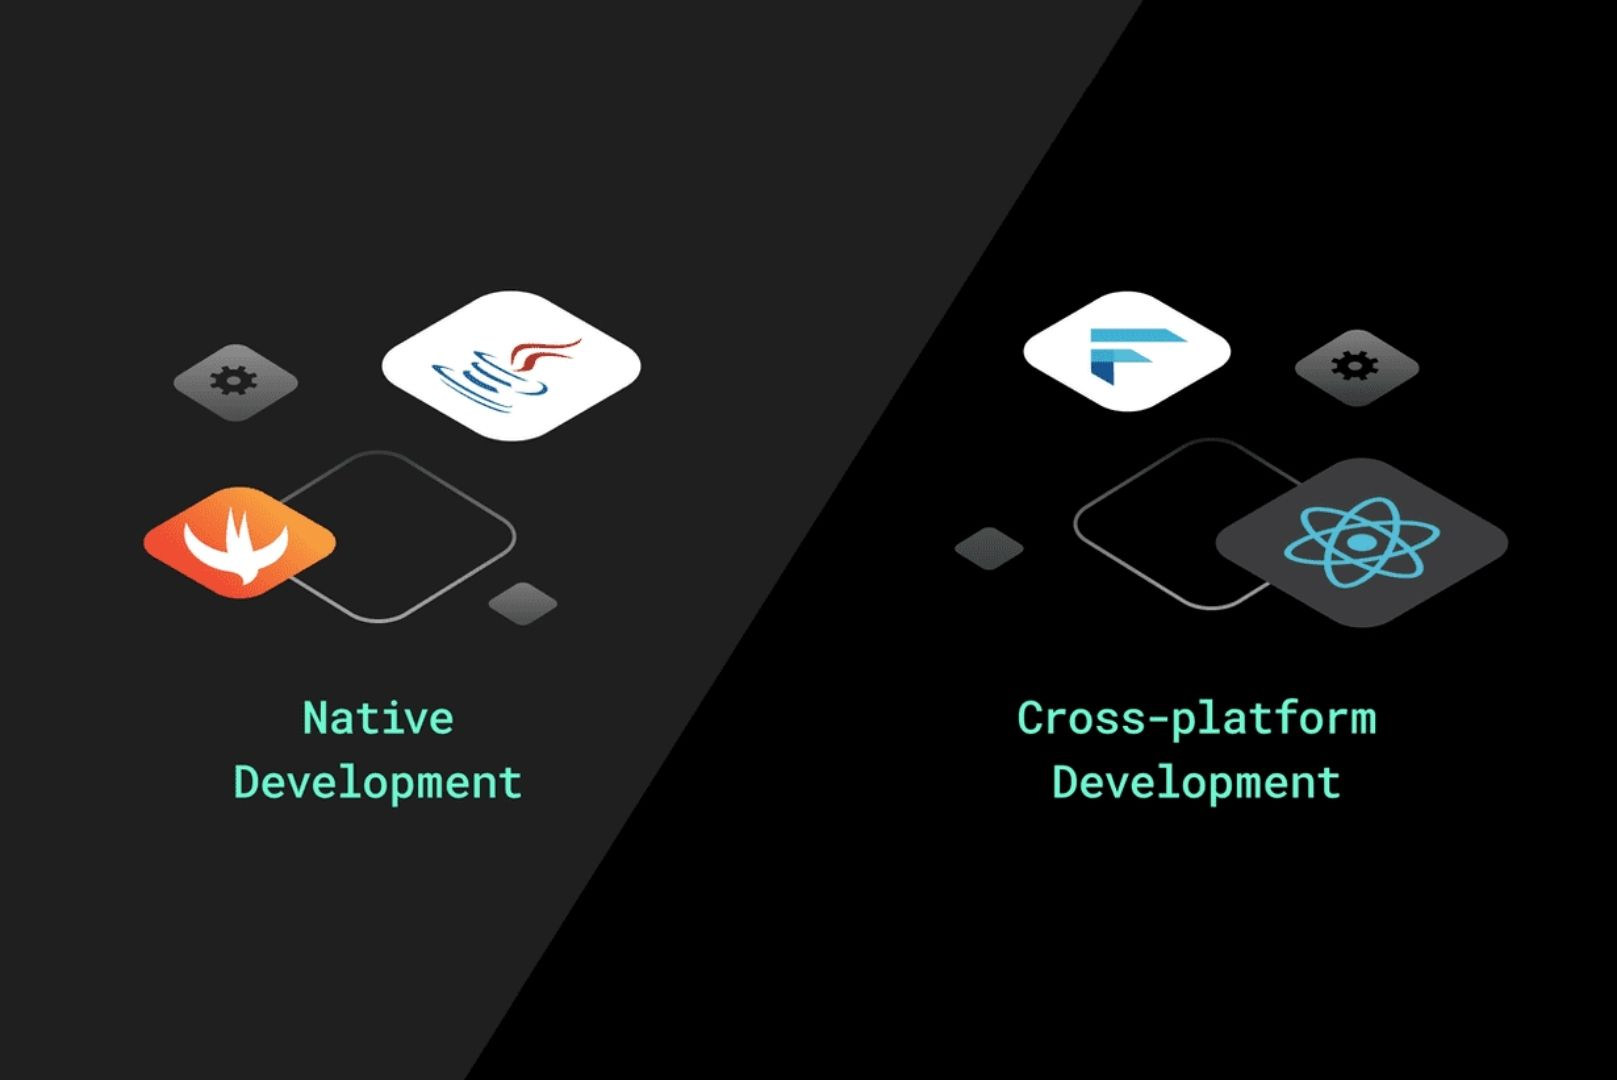 Native vs Cross-platform app development